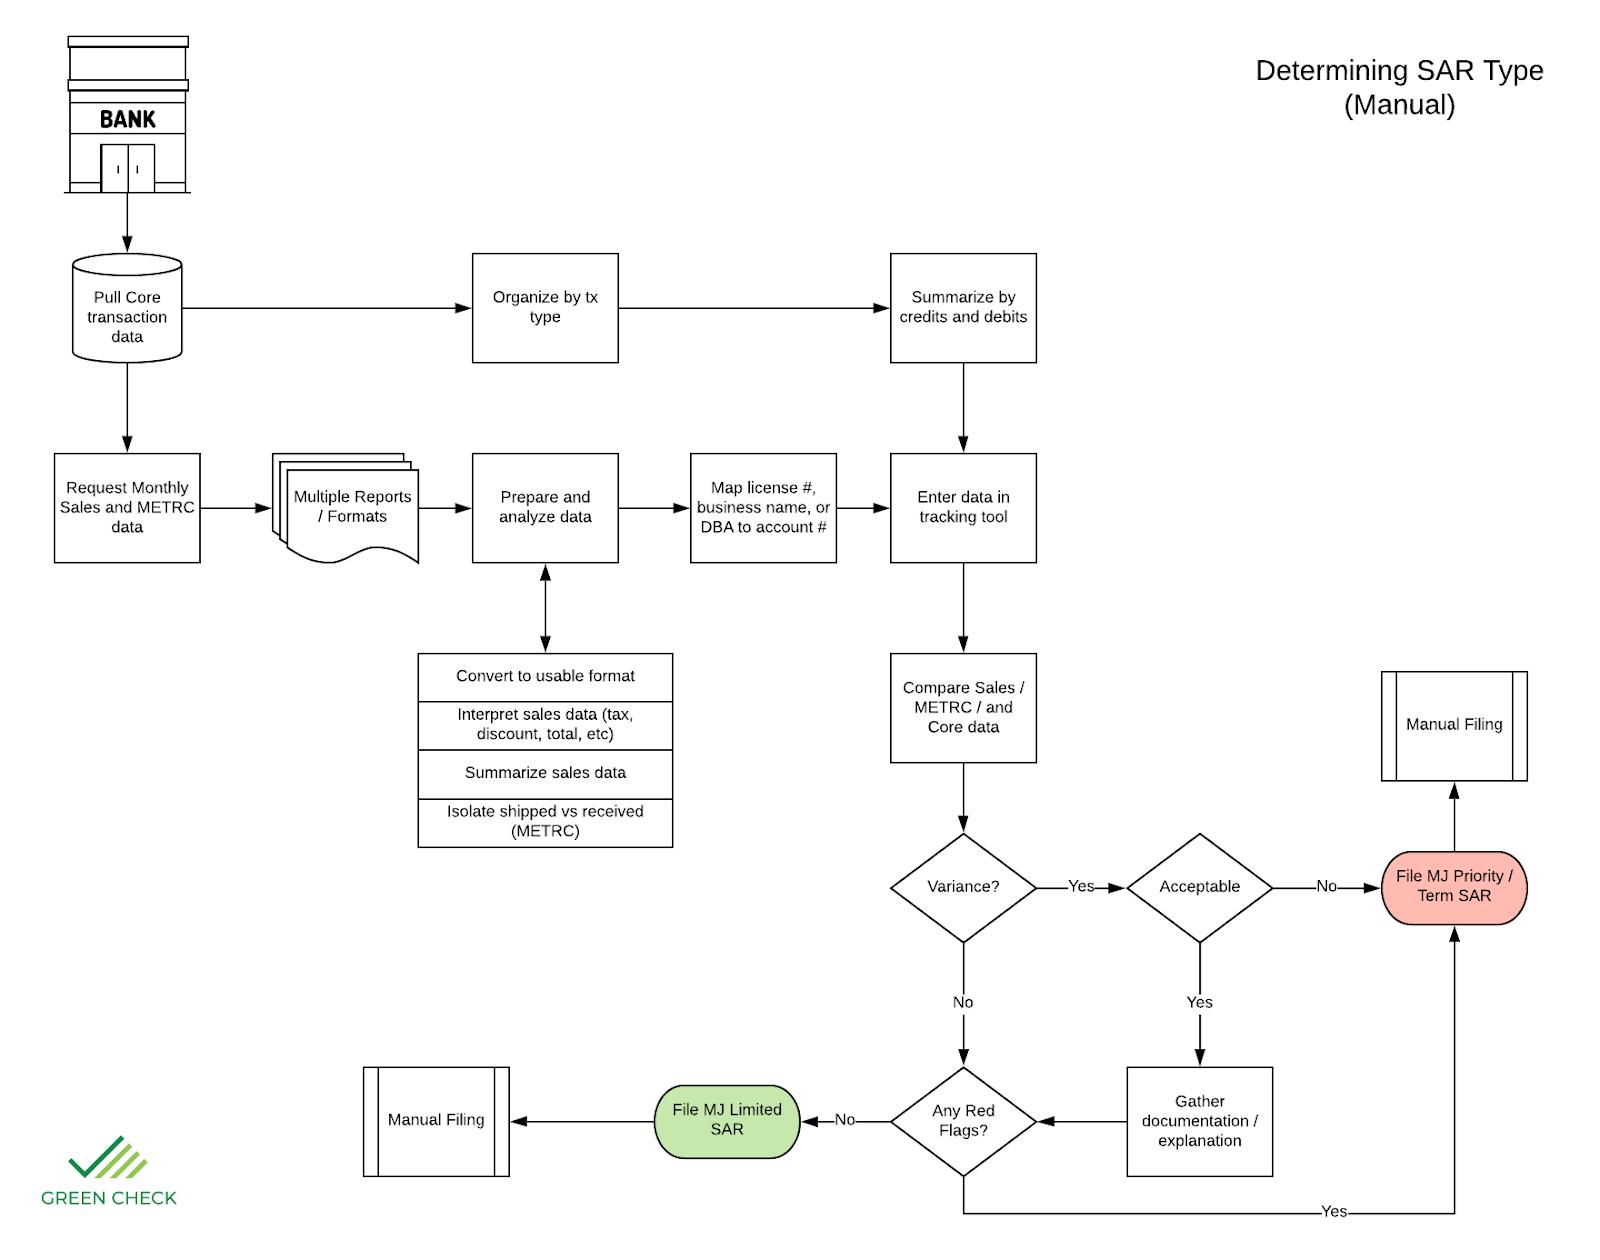 Manual SAR Type Determination